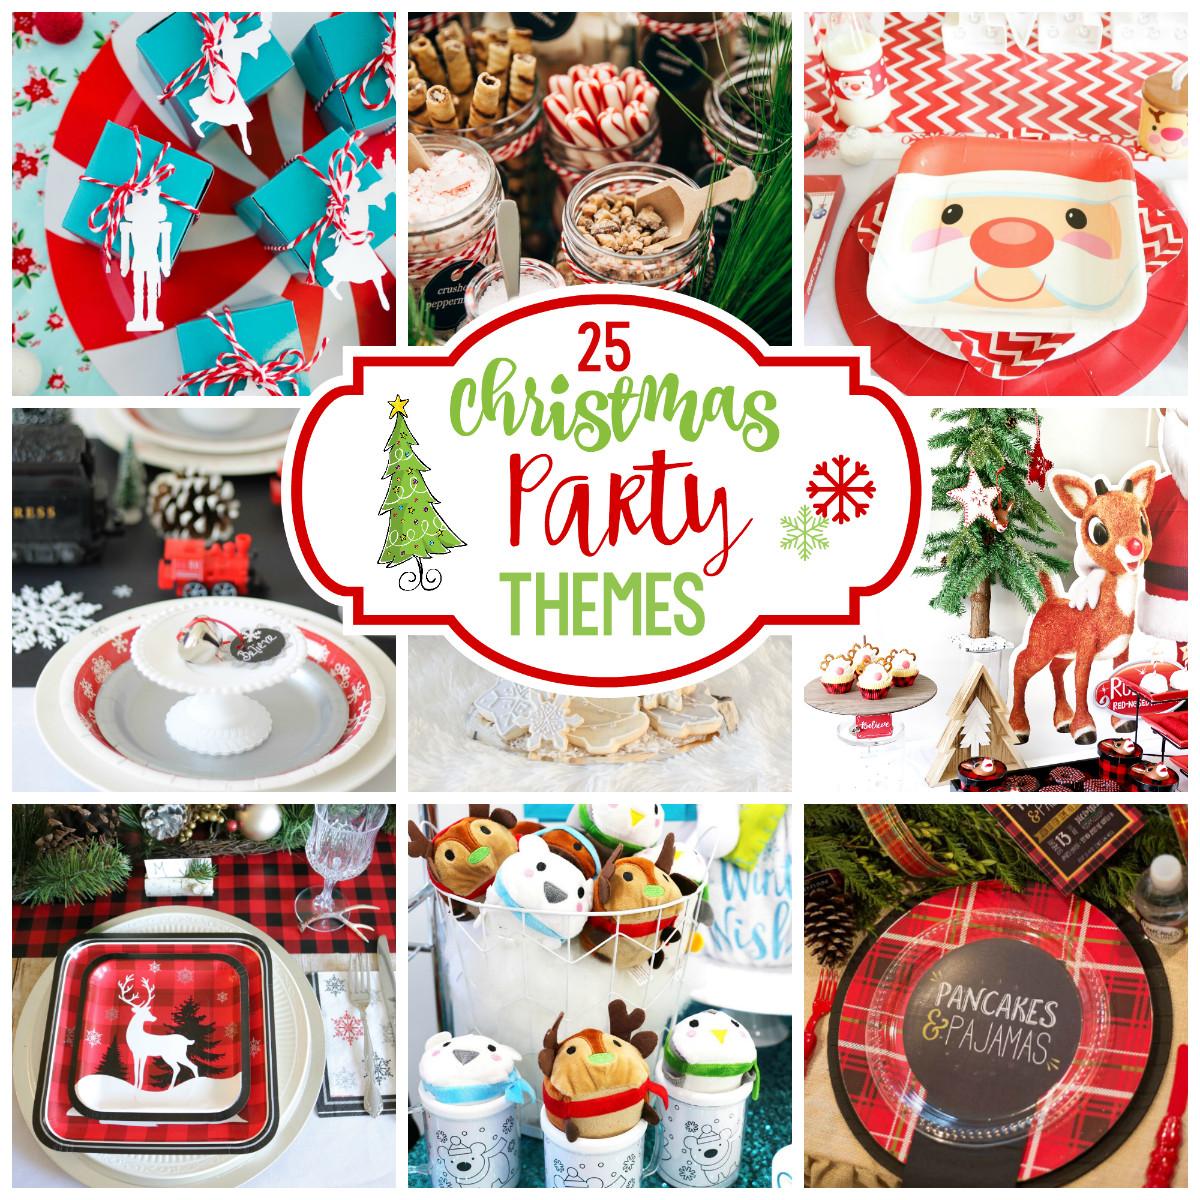 Family Holiday Party Ideas  25 Fun Christmas Party Theme Ideas – Fun Squared